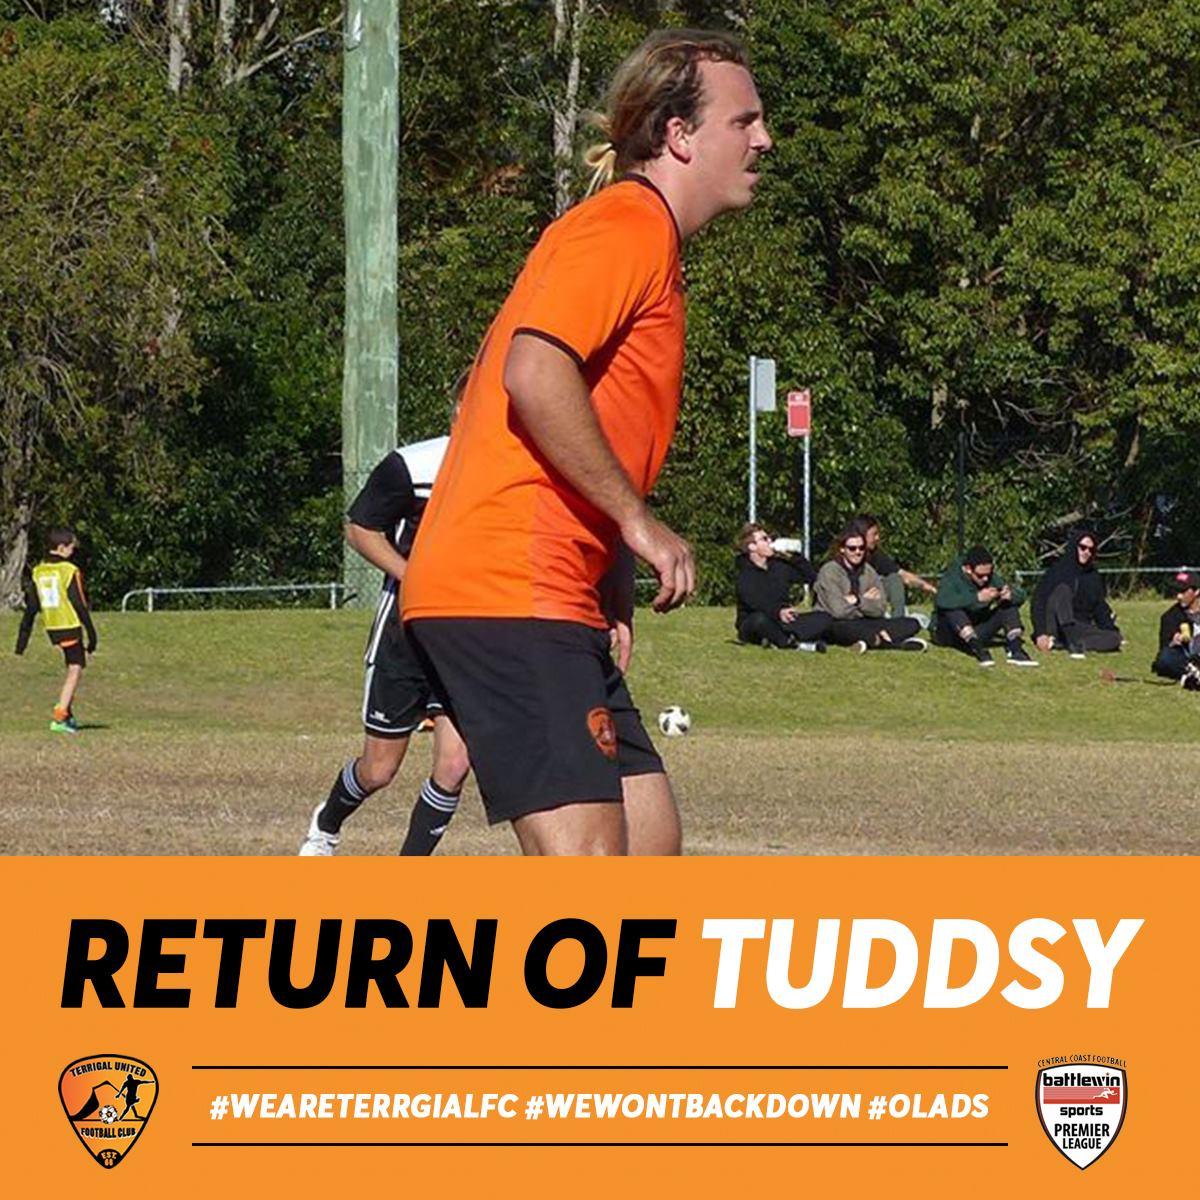 Return of Tuddsy